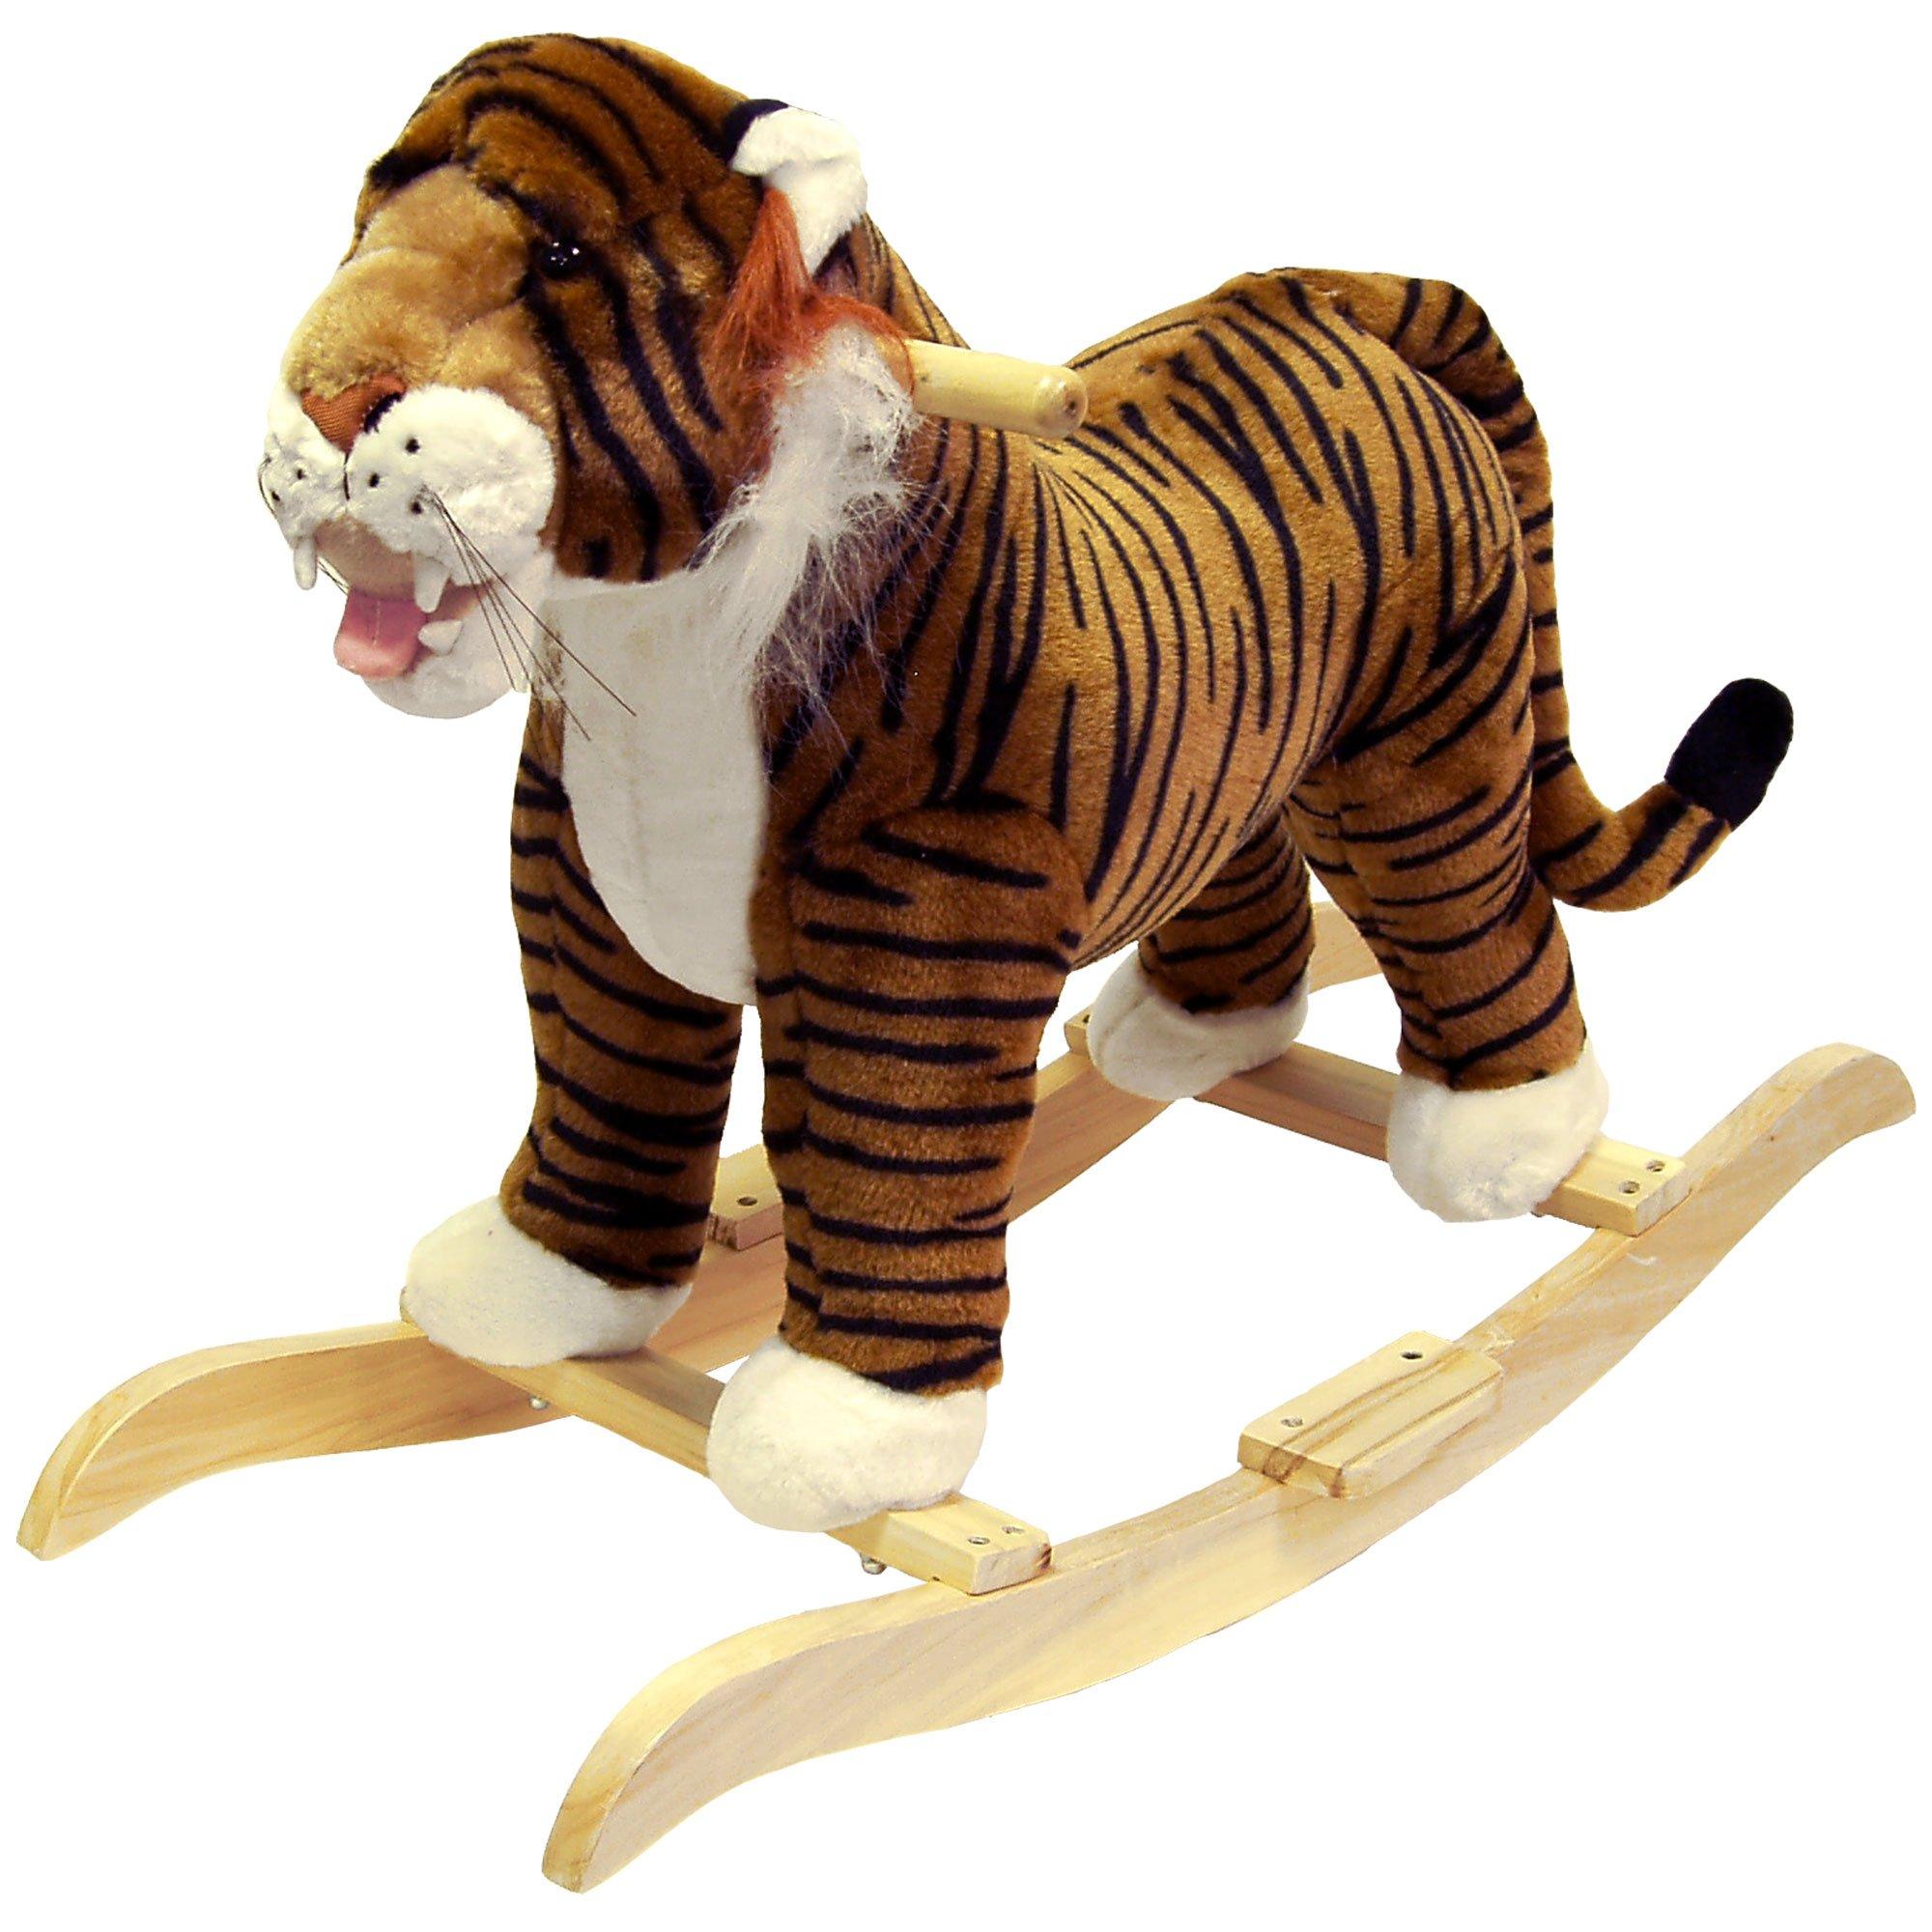 Happy Trails Tiger Plush Rocking Animal Ride On